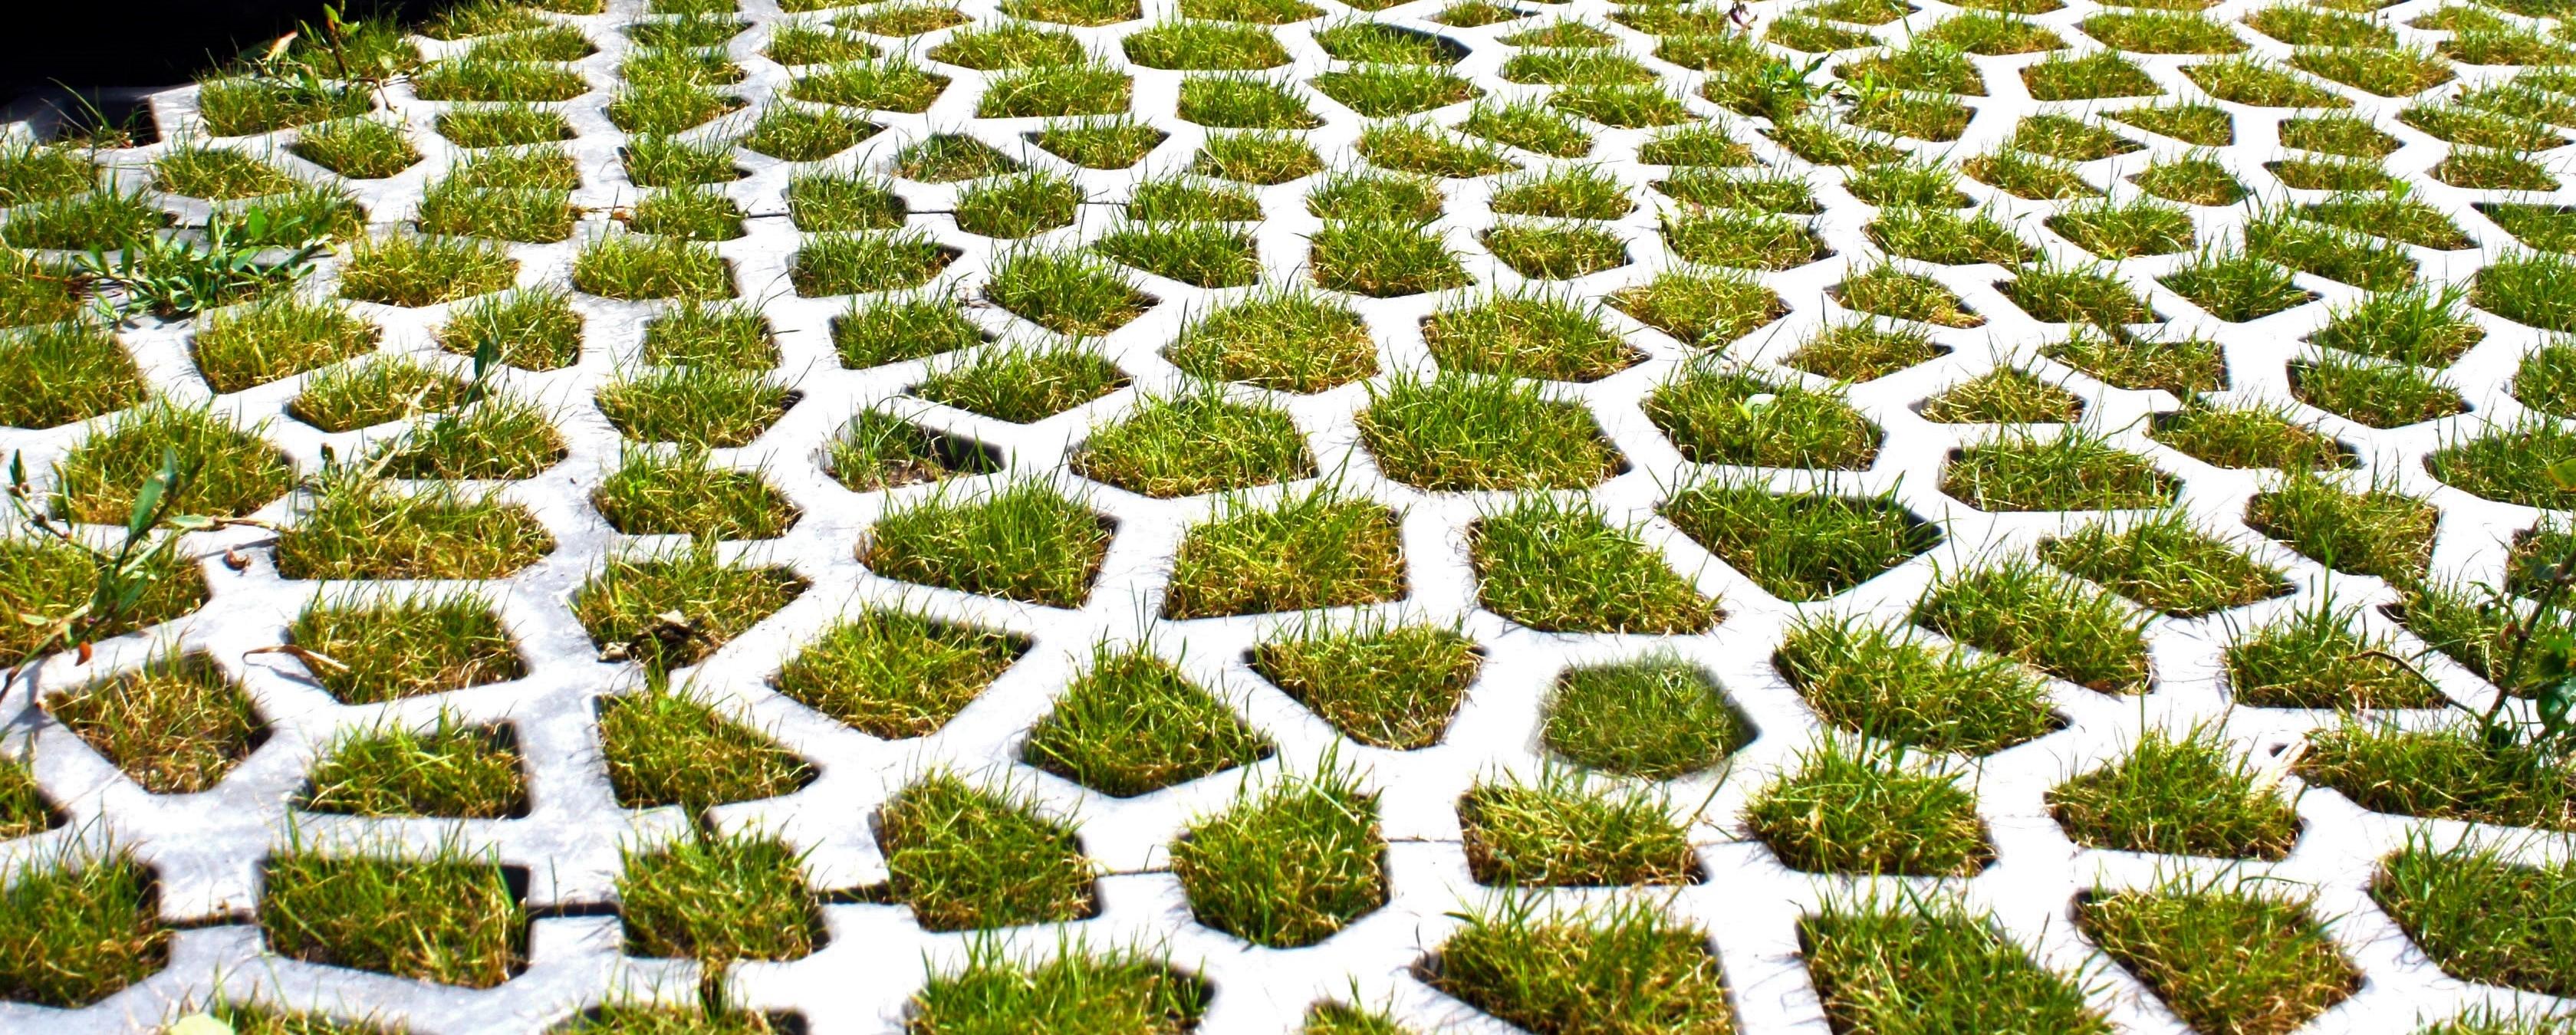 XMaterials Grass